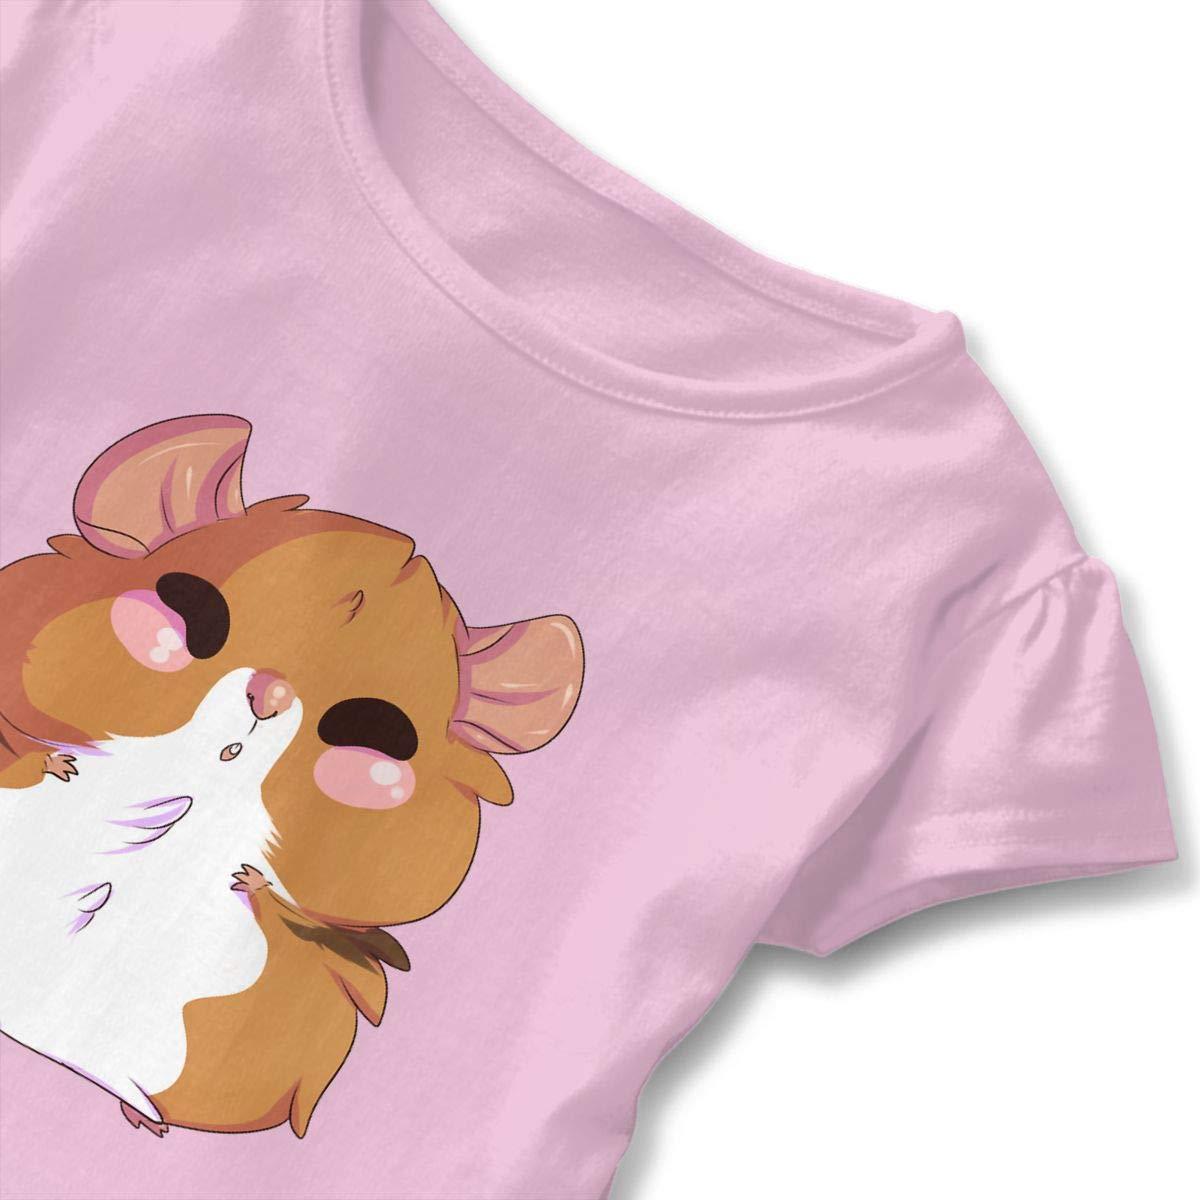 Hamster Everything Cute Short Sleeve Clothes for Boy Girl Dress Cotton T-Shirt Unique Bodysuit Romper,One-Piece Jumpsuit